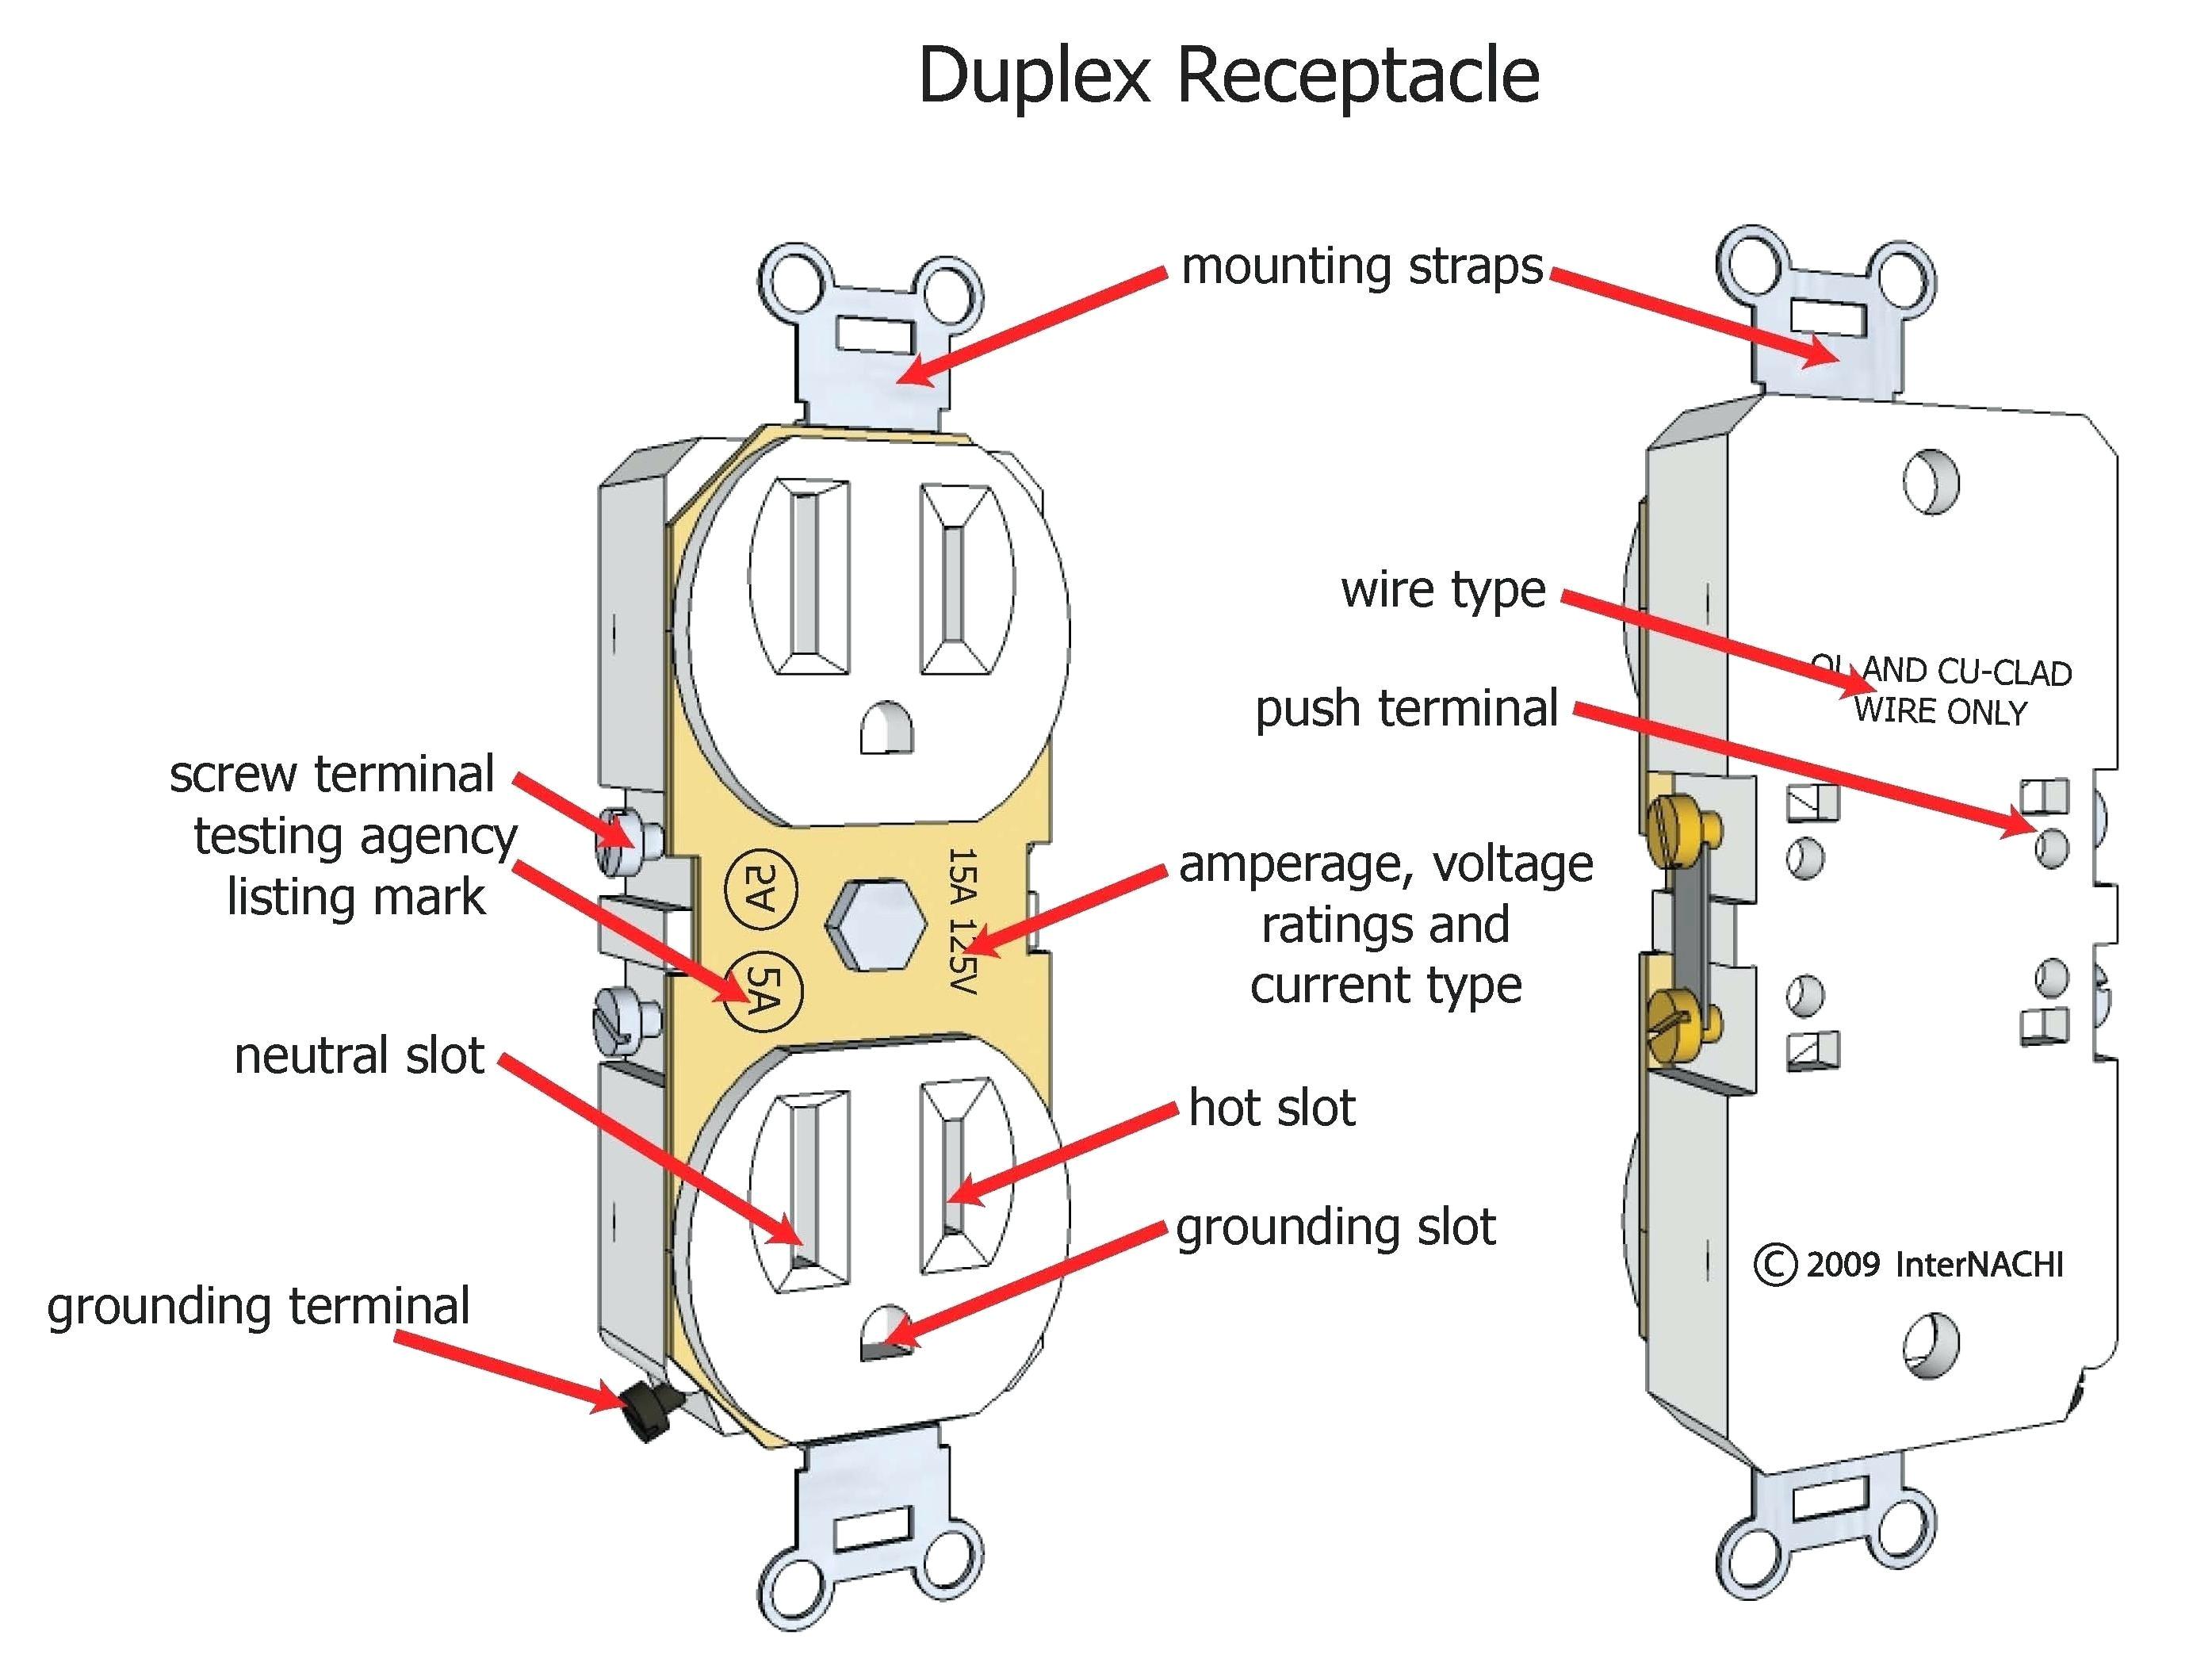 plug in wire diagram wiring diagram megawire diagram 120 3 prong plugs wiring diagram datasource 3